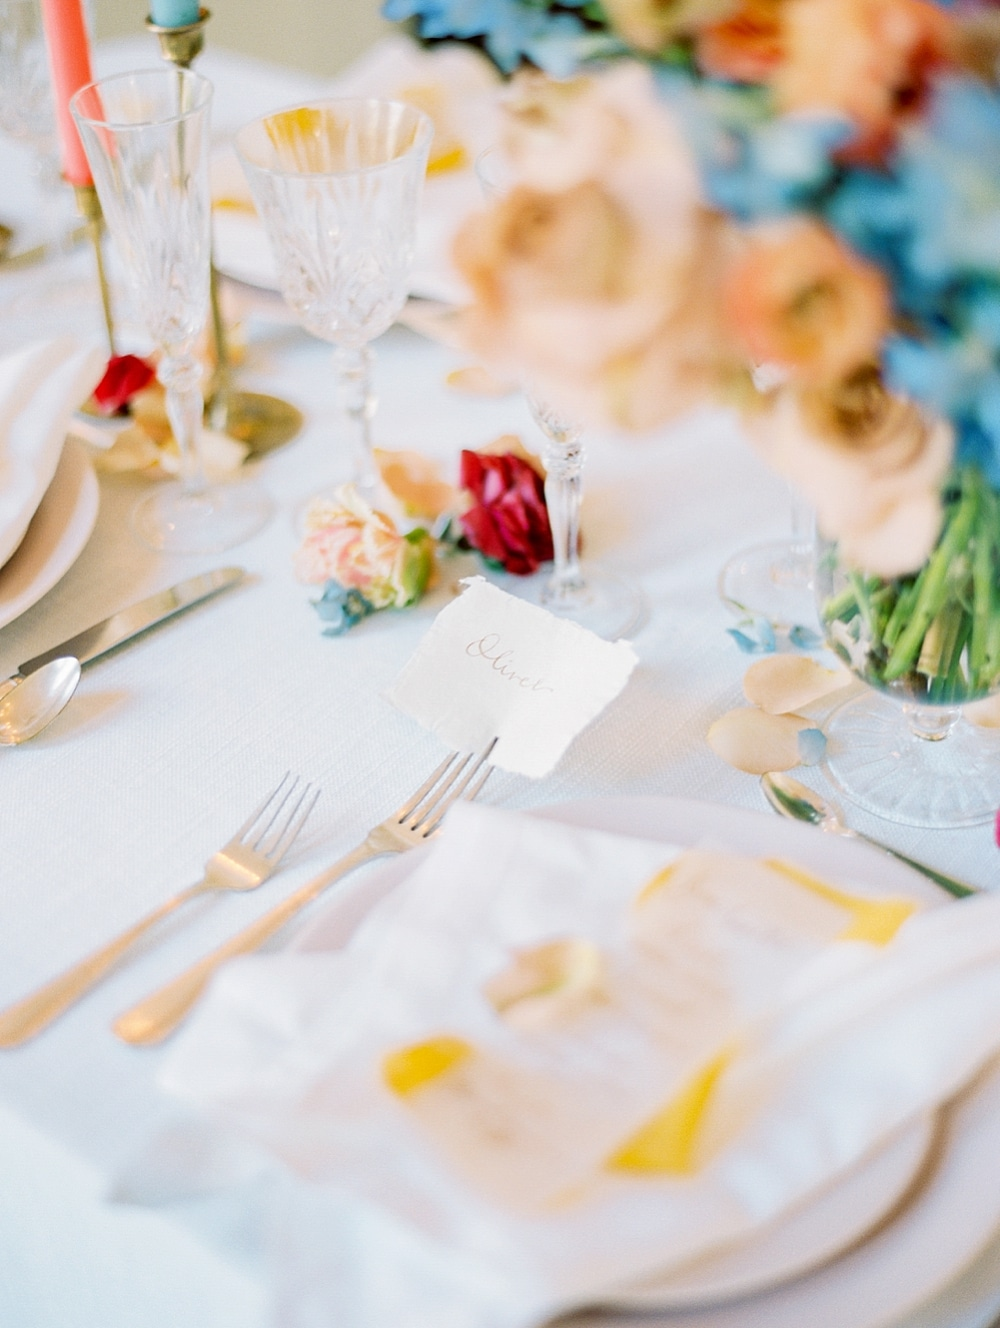 kristin-la-voie-photography-austin-wedding-photographer-woodbine-mansion-10